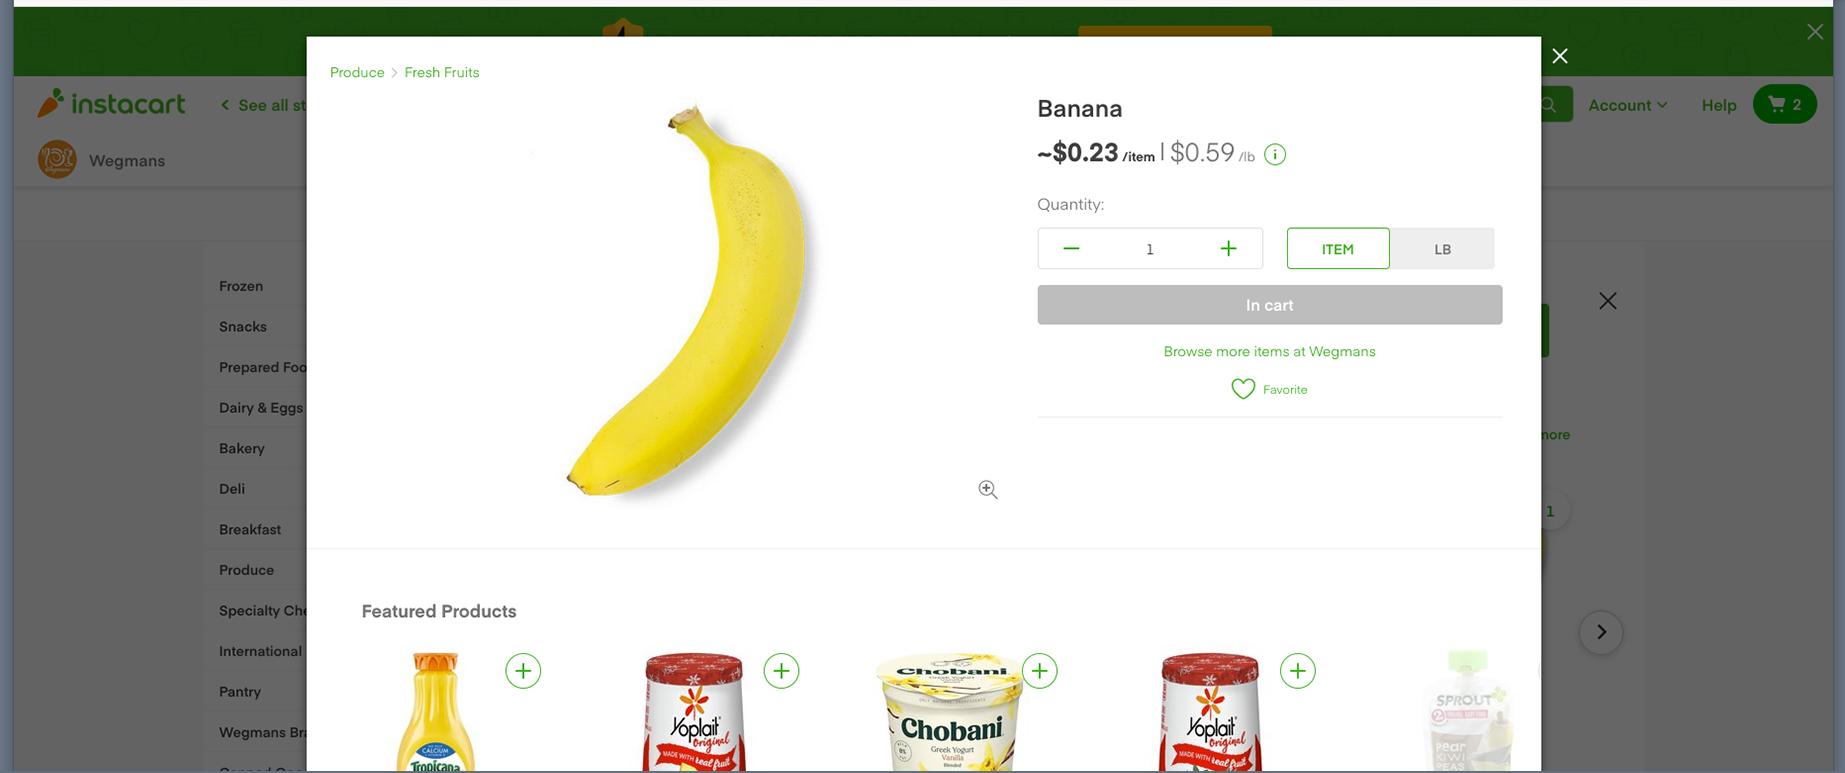 Screen shot of banana screen on Instacart web page for Wegmans.